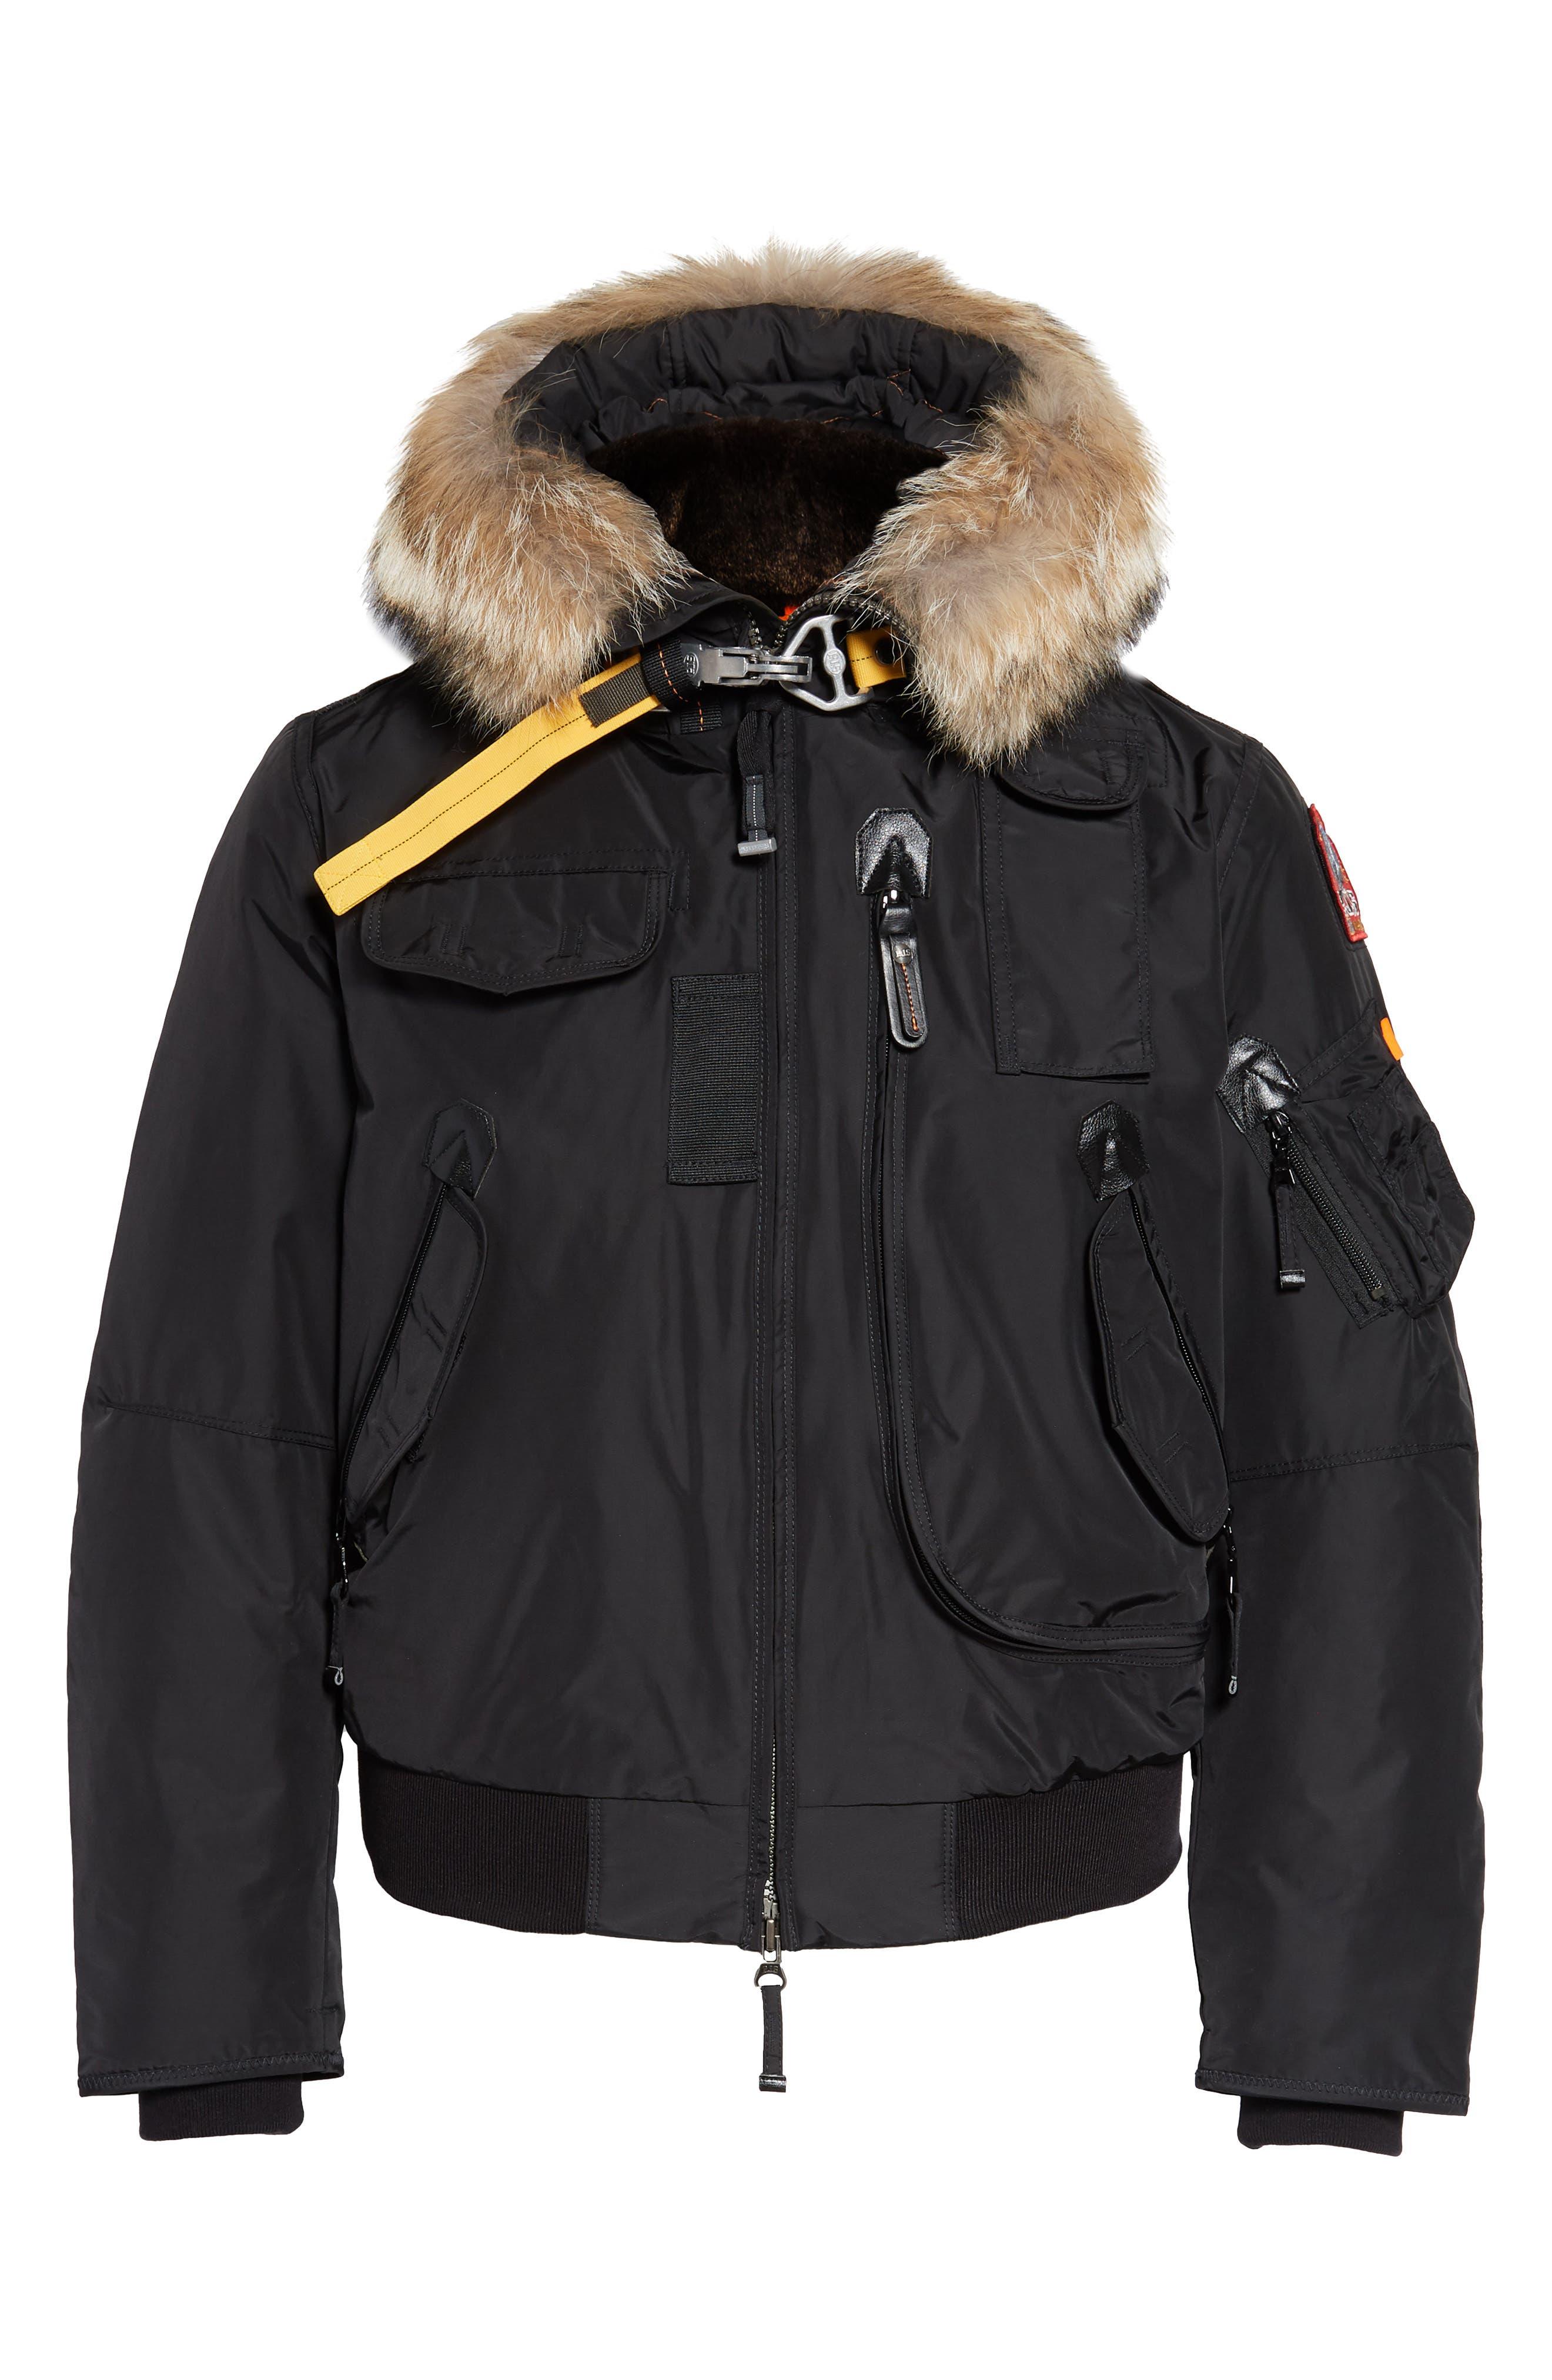 Gobi 700 Fill Power Down Bomber Jacket with Genuine Coyote Fur Trim,                             Alternate thumbnail 6, color,                             BLACK